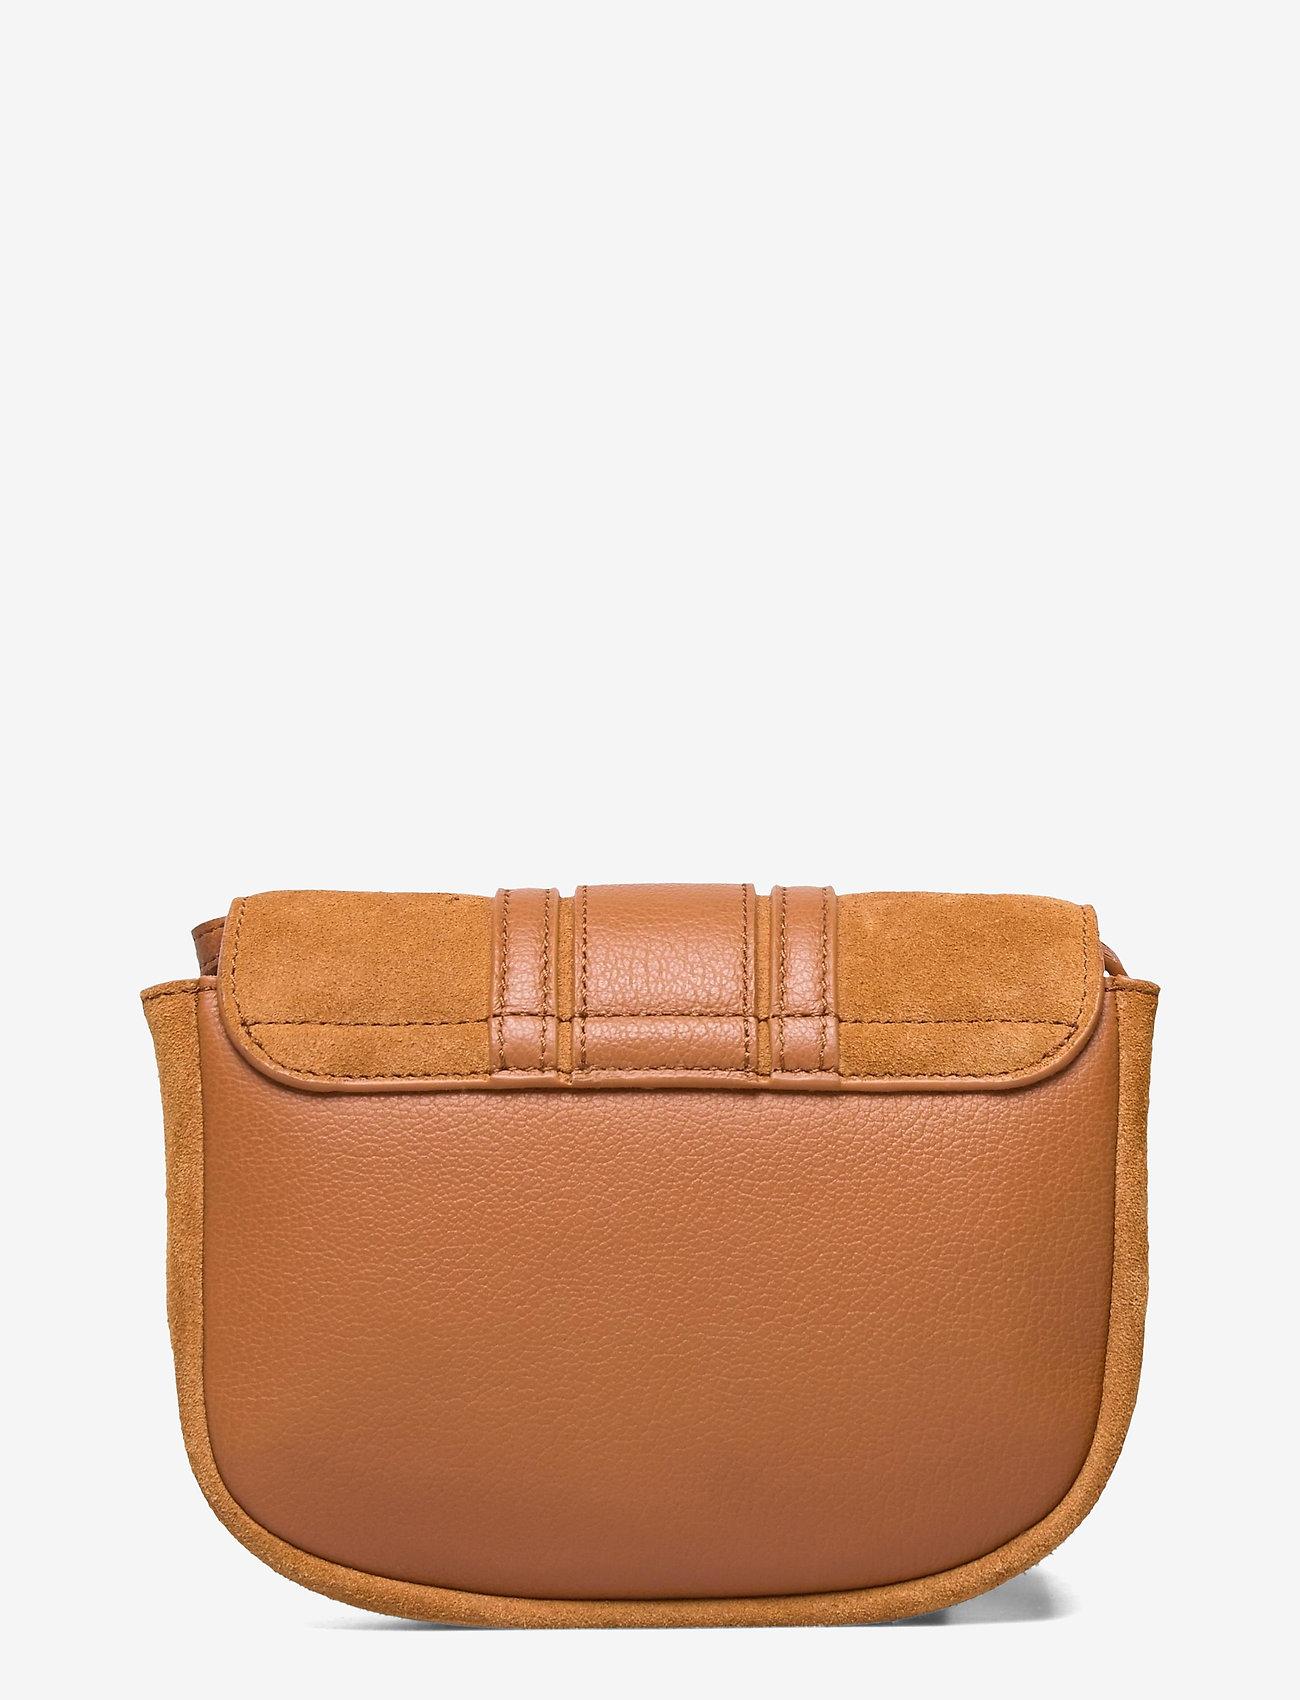 See by Chloé - HANA SBC - crossbody bags - caramello - 1